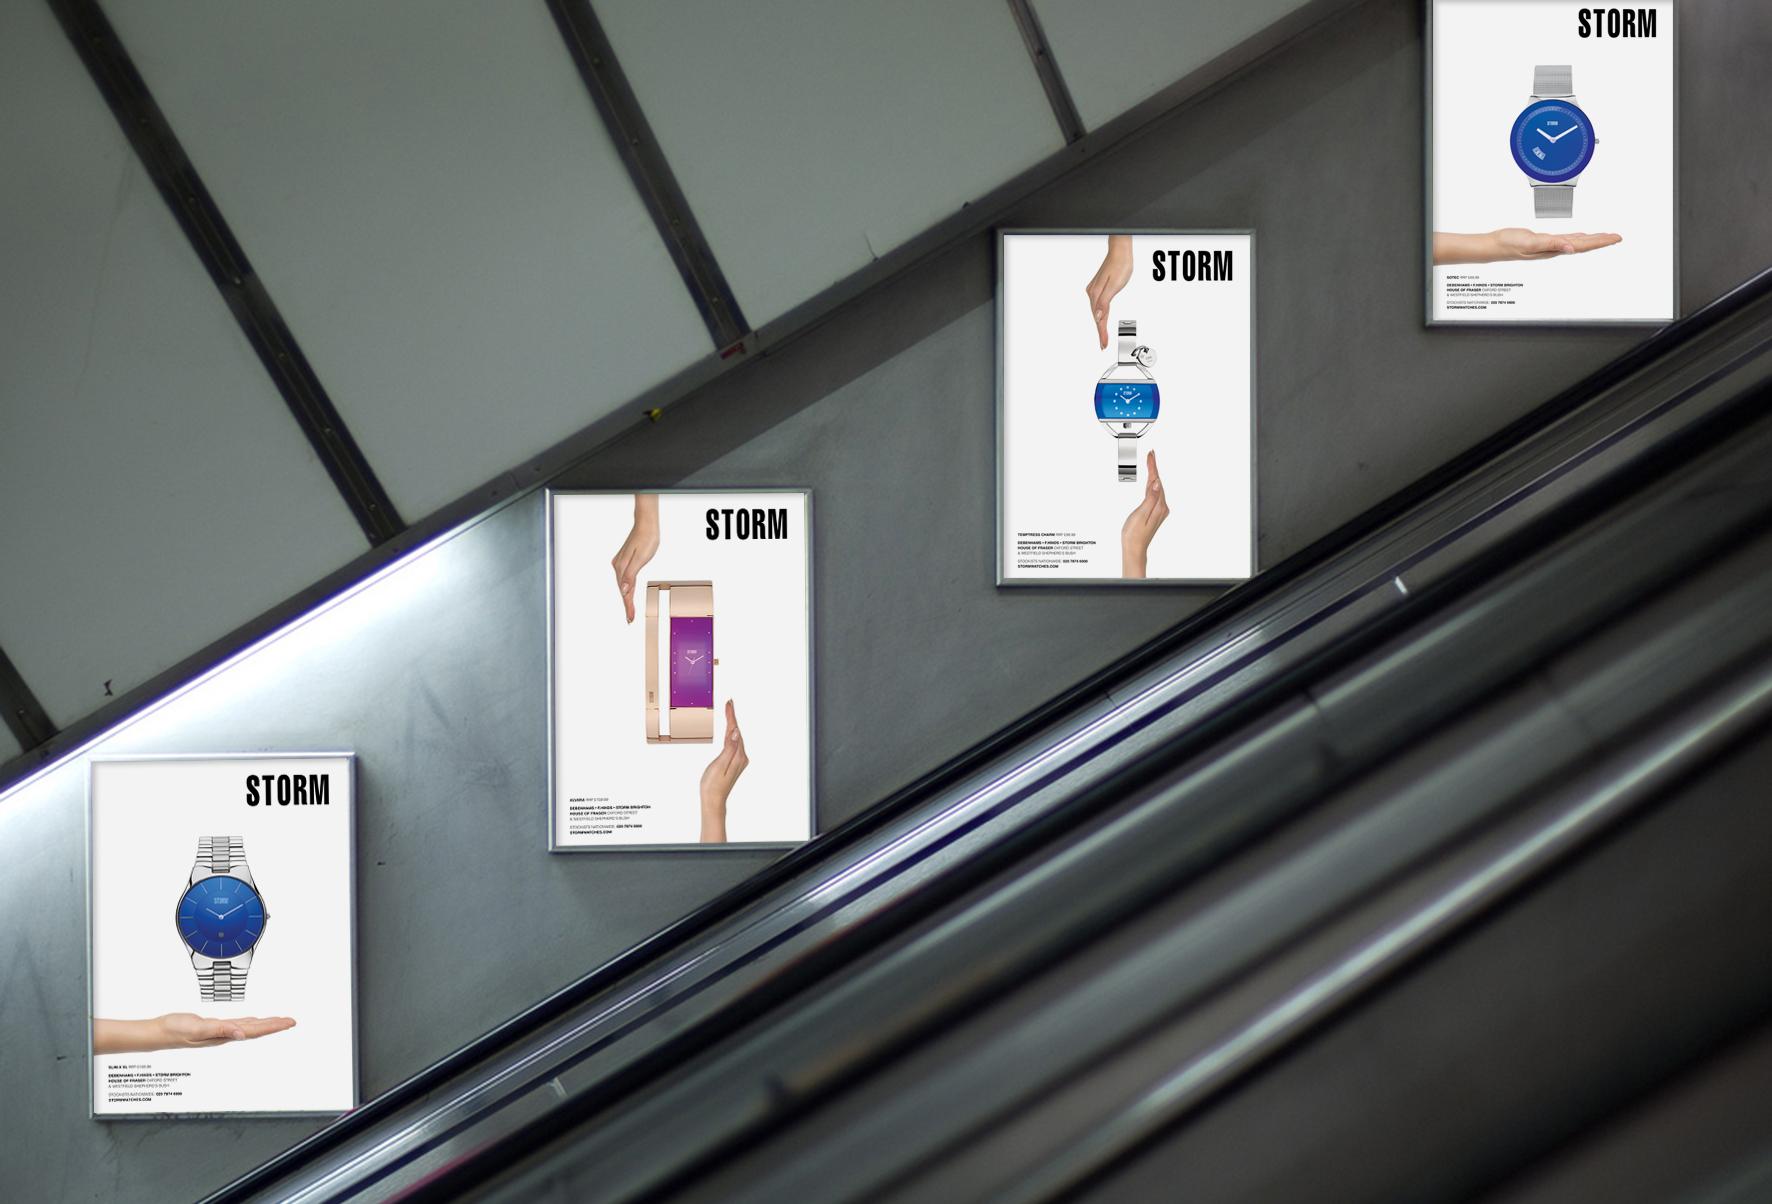 Posters on the escallator in Pimlico Station.